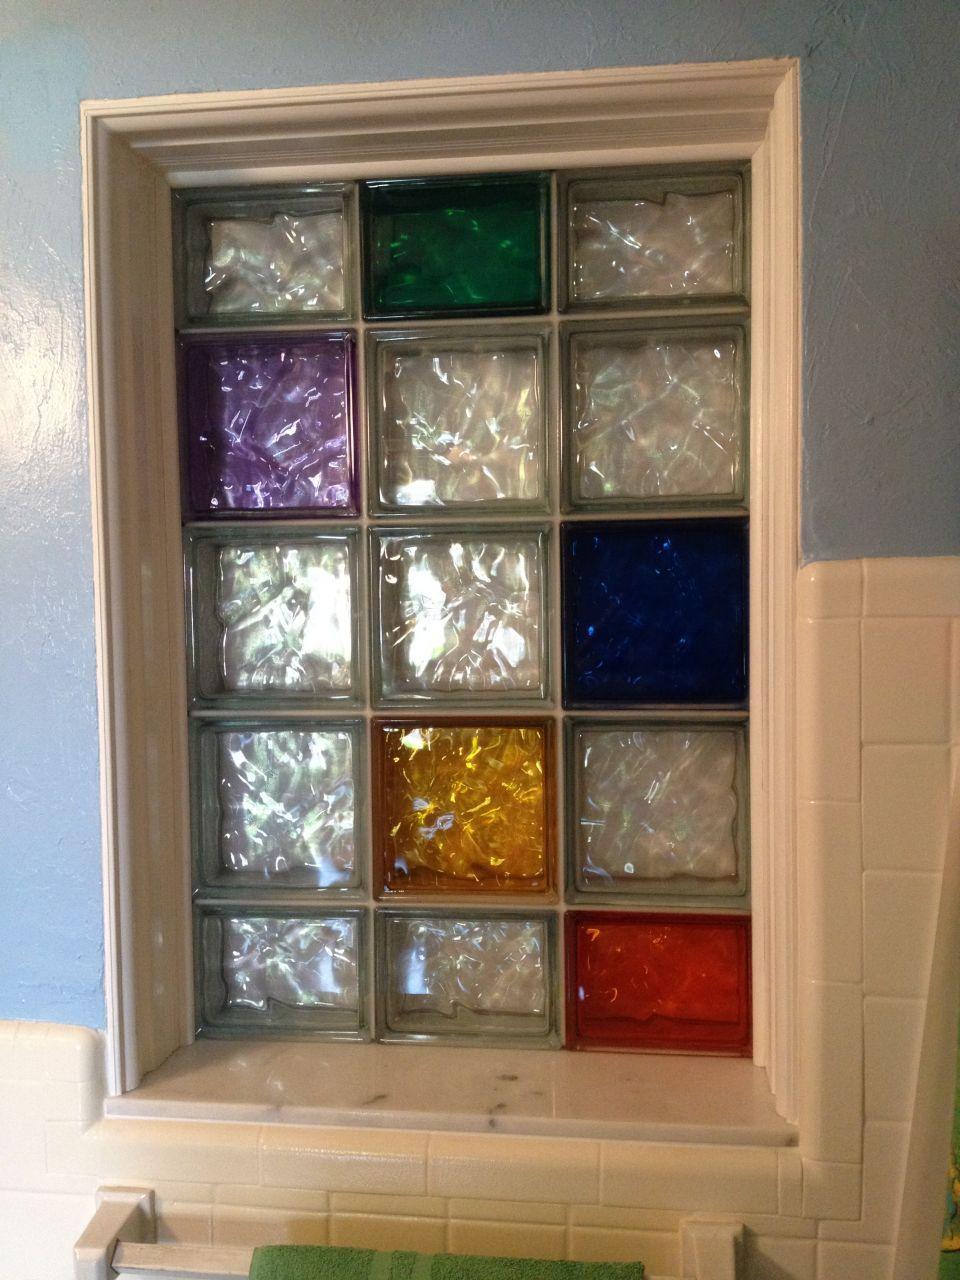 decorative glass bathroom windows project spotlight using art glass tile blocks in a kitchen  glass tile blocks